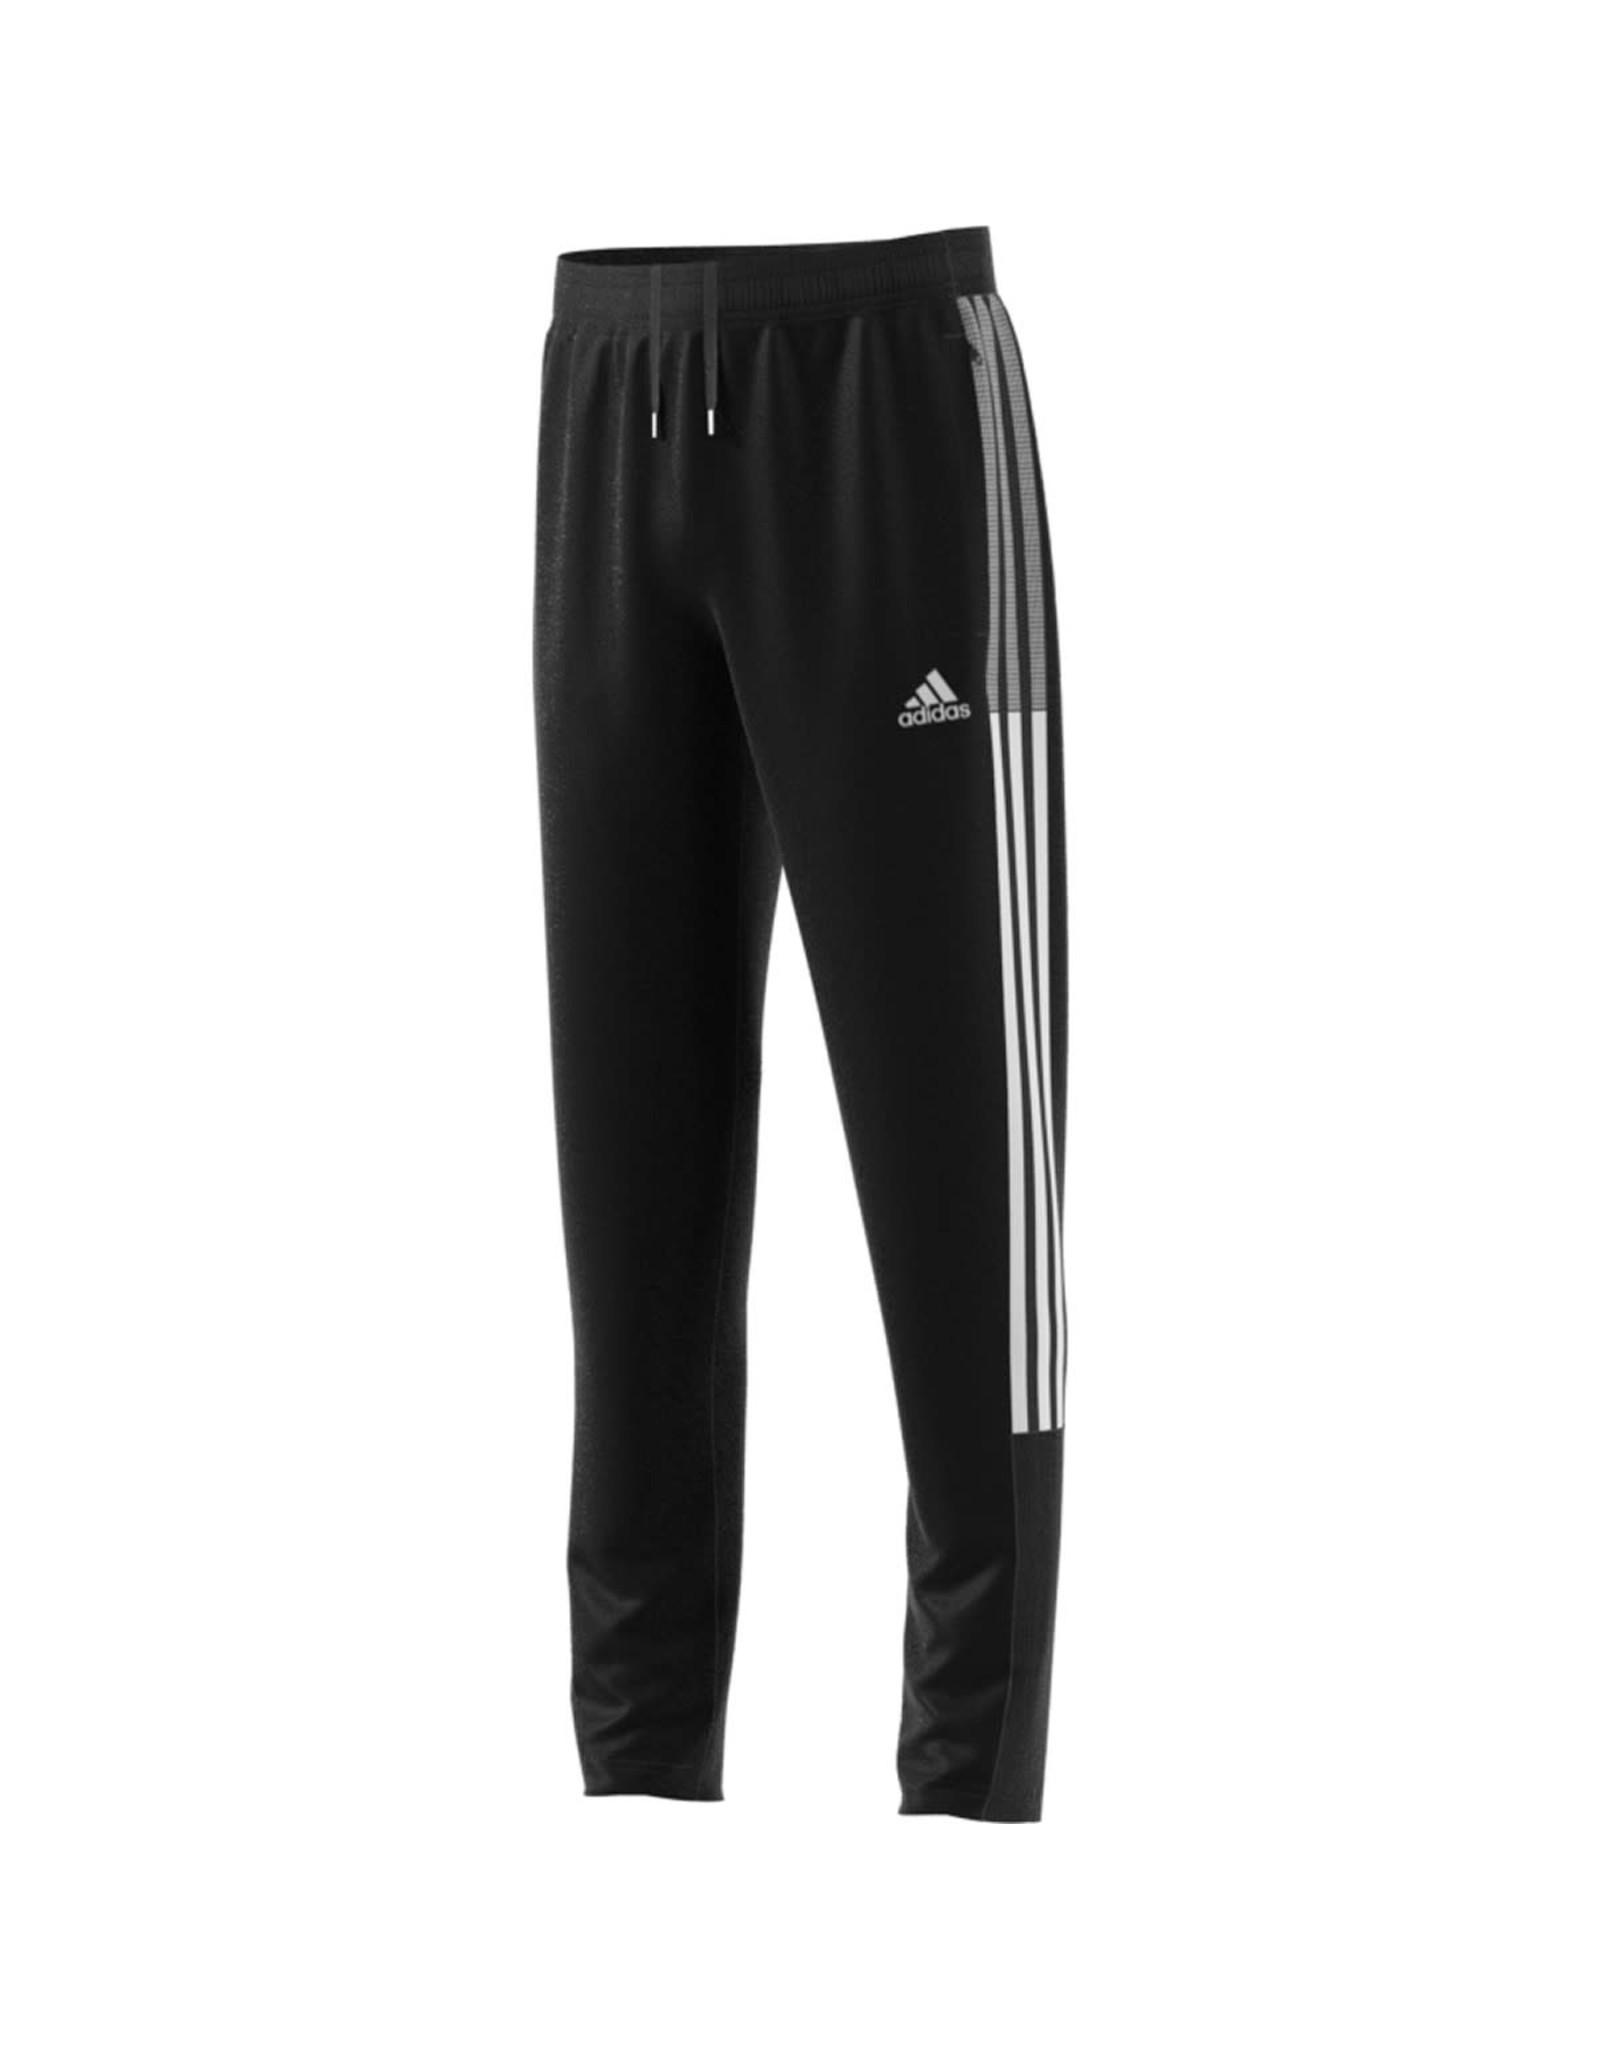 Adidas ADIDAS TIRO21 YOUTH PANT